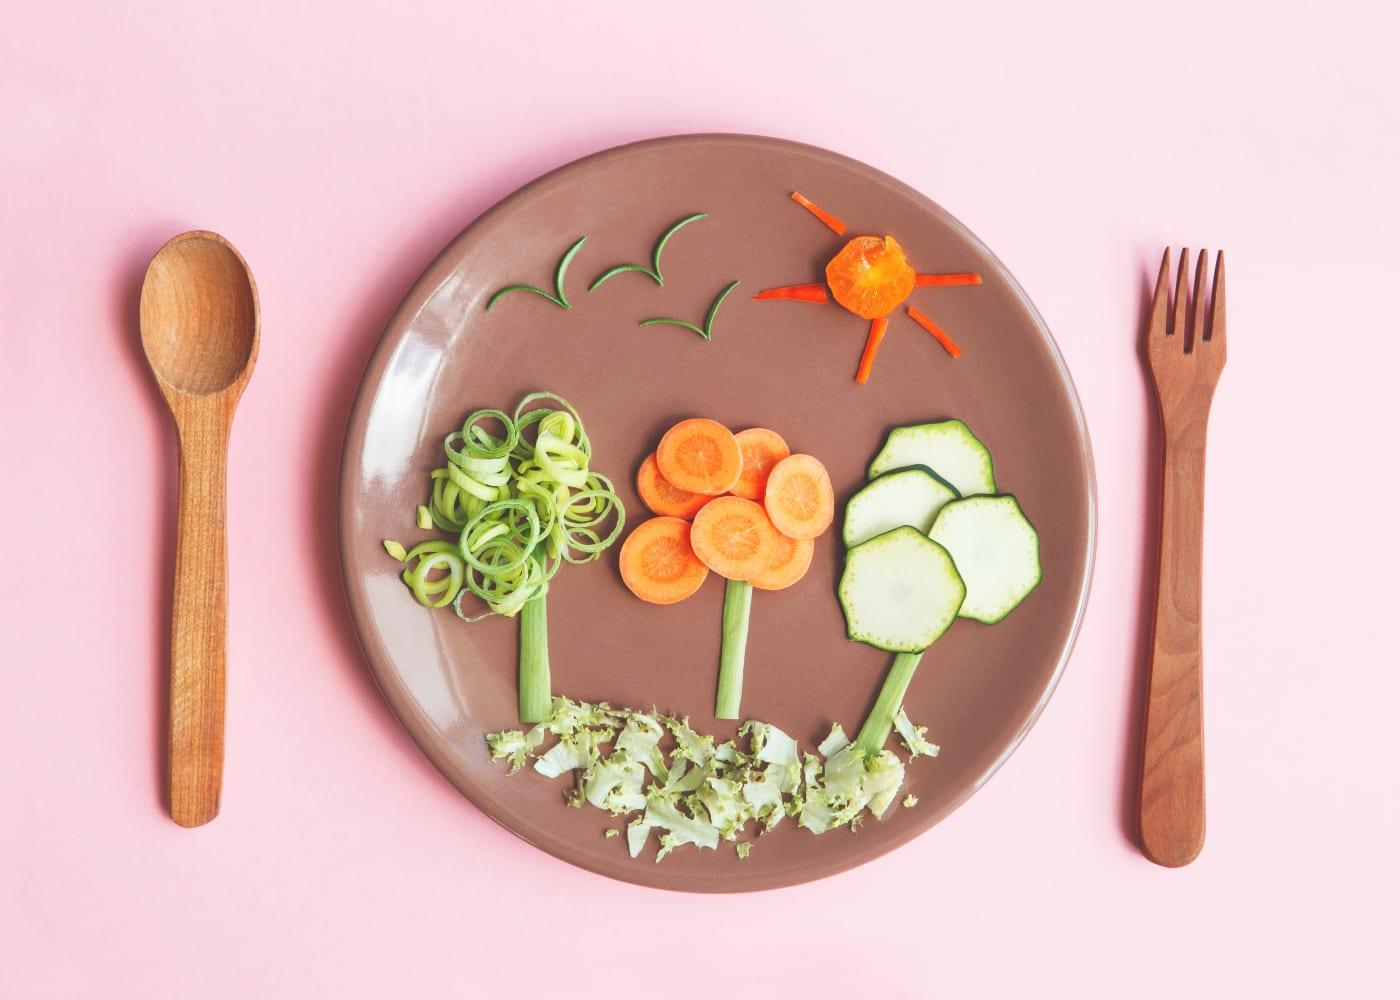 plant-based meals for kids